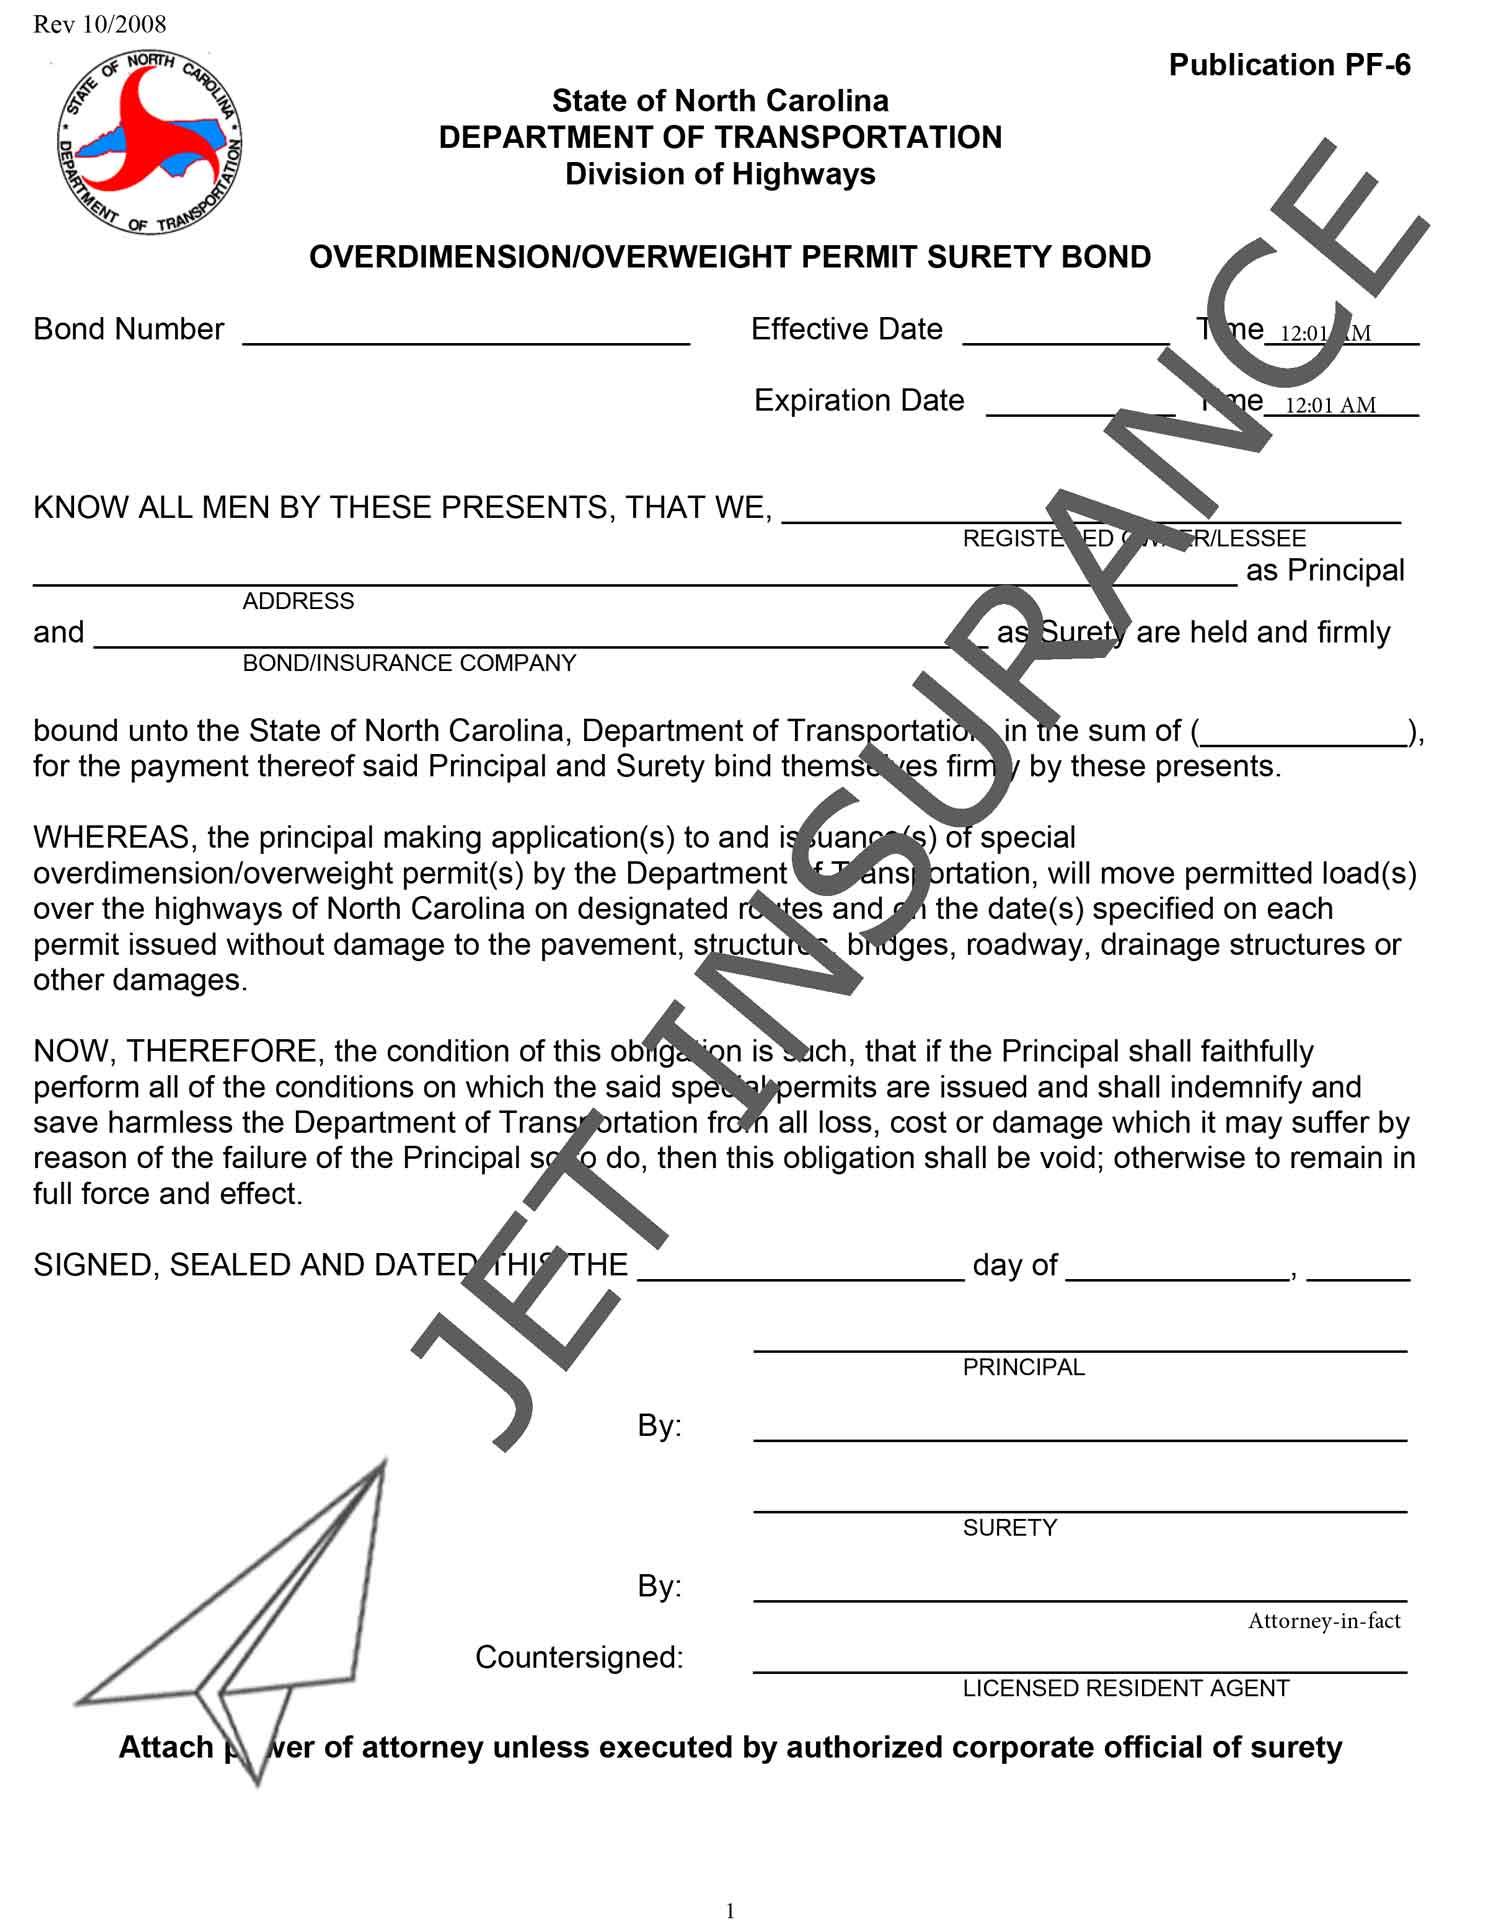 North Carolina Oversize or Overweight Permit Bond Form